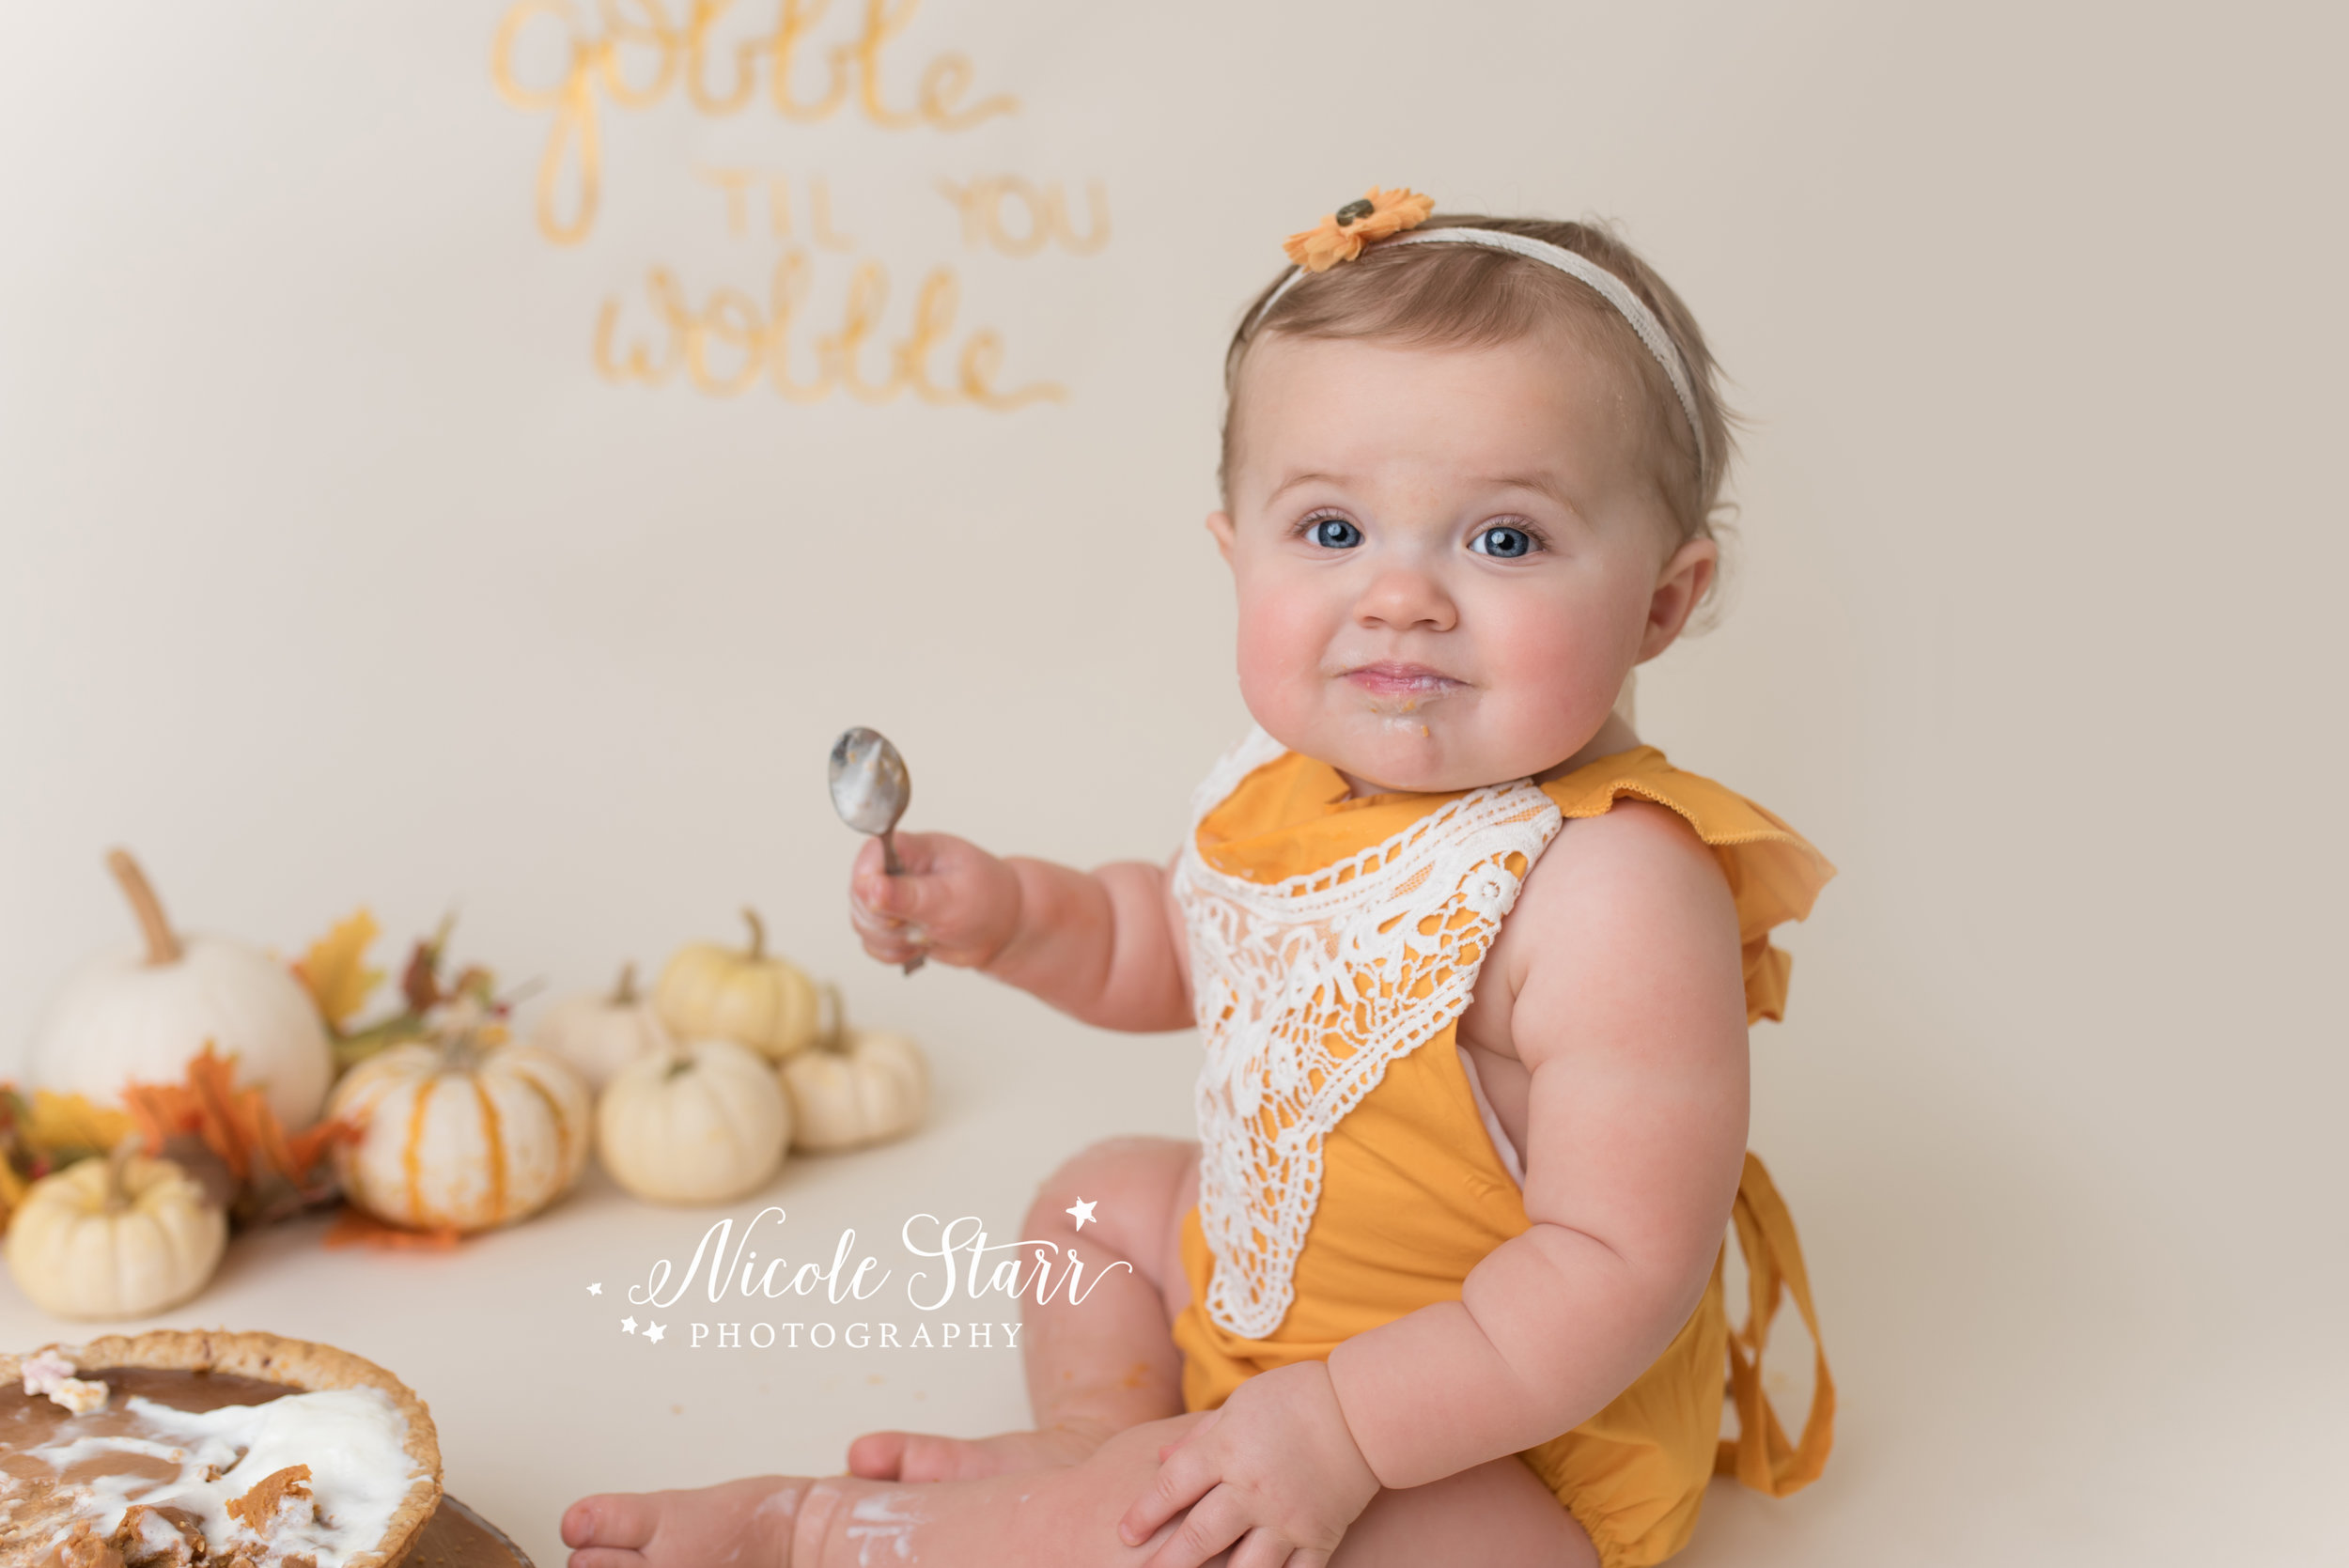 Nicole Starr Photography   Saratoga Springs Pumpkin Pie Smash Photographer   Boston Pumpkin Pie Smash Photographer   Saratoga Springs Baby Photographer   Boston Baby Photographer   pumpkin pie